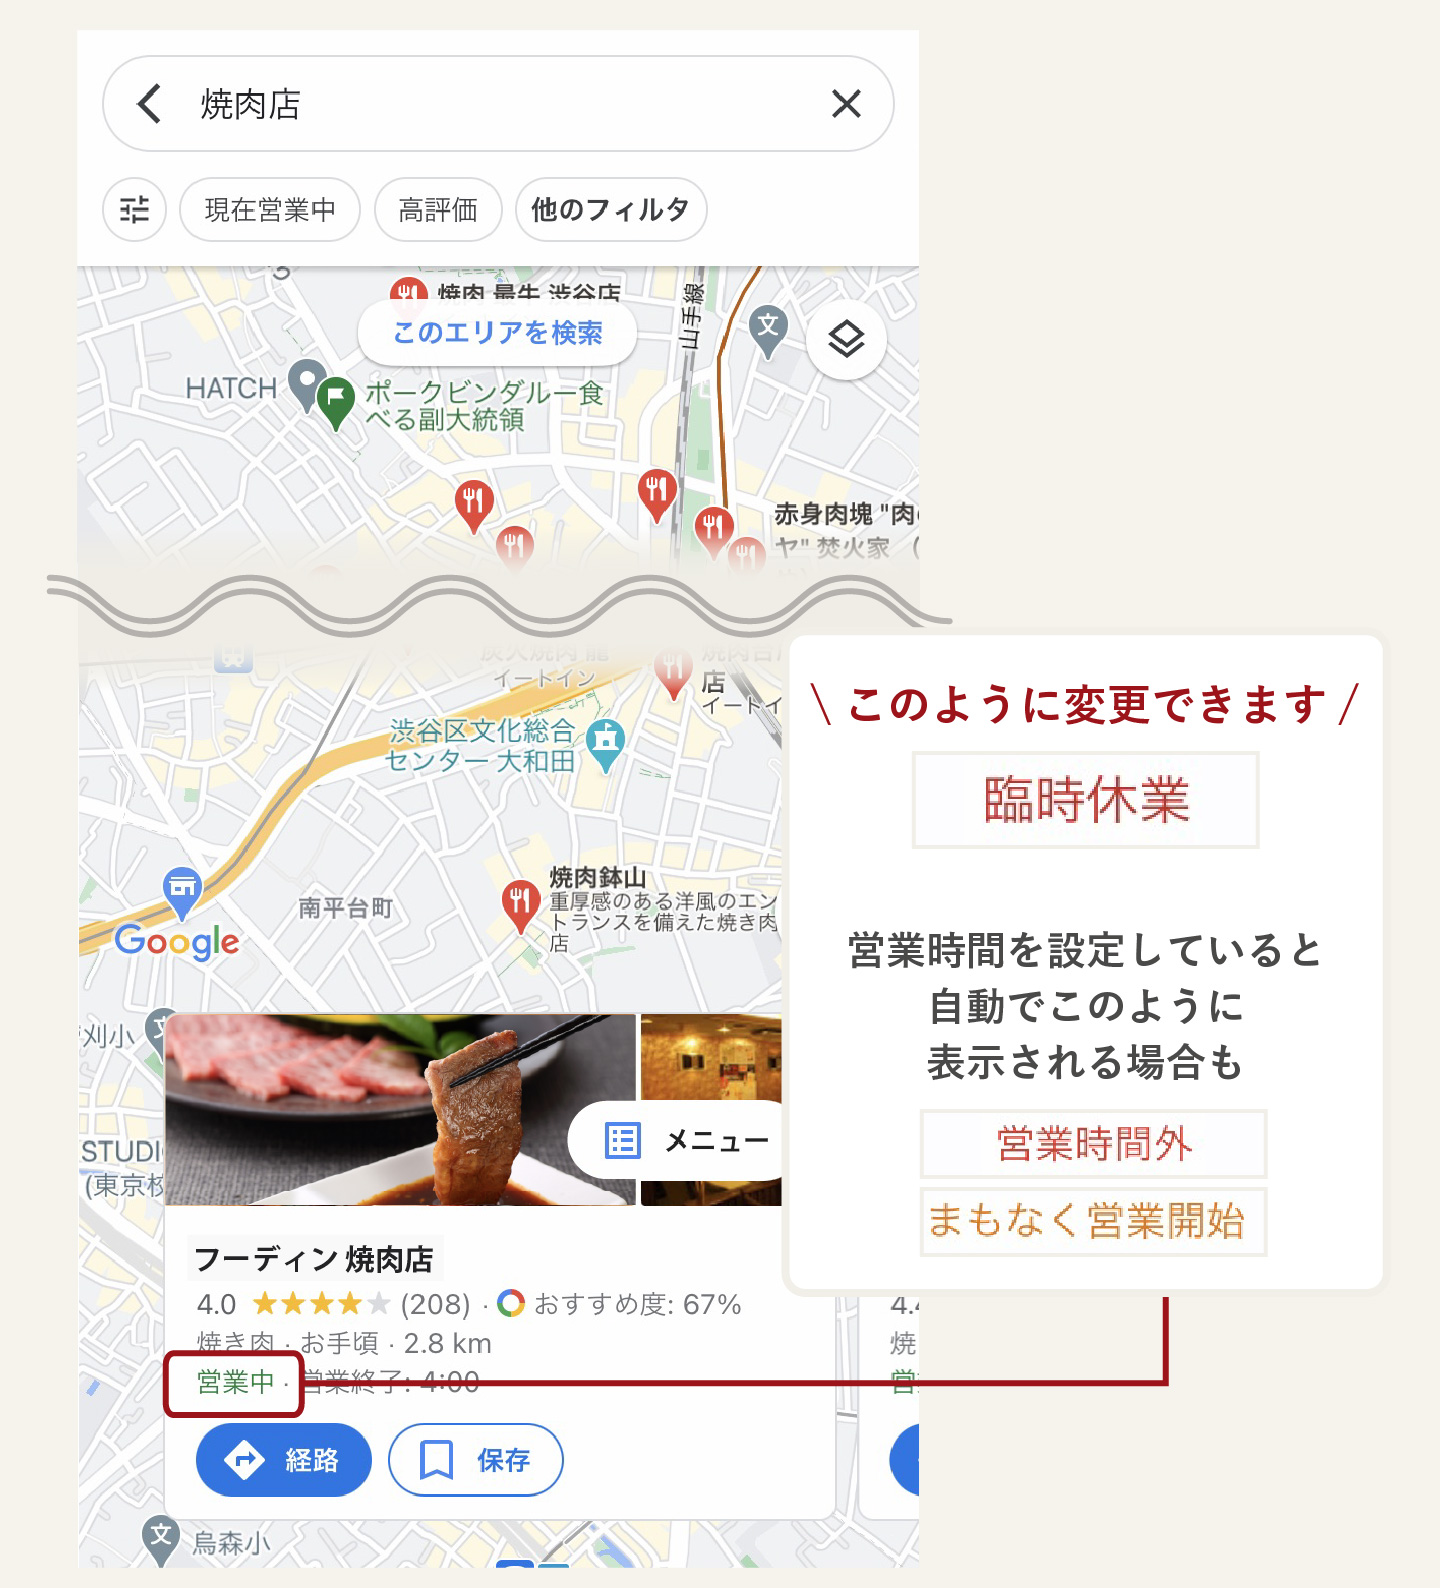 Googleマップ上にある臨時休業マーク